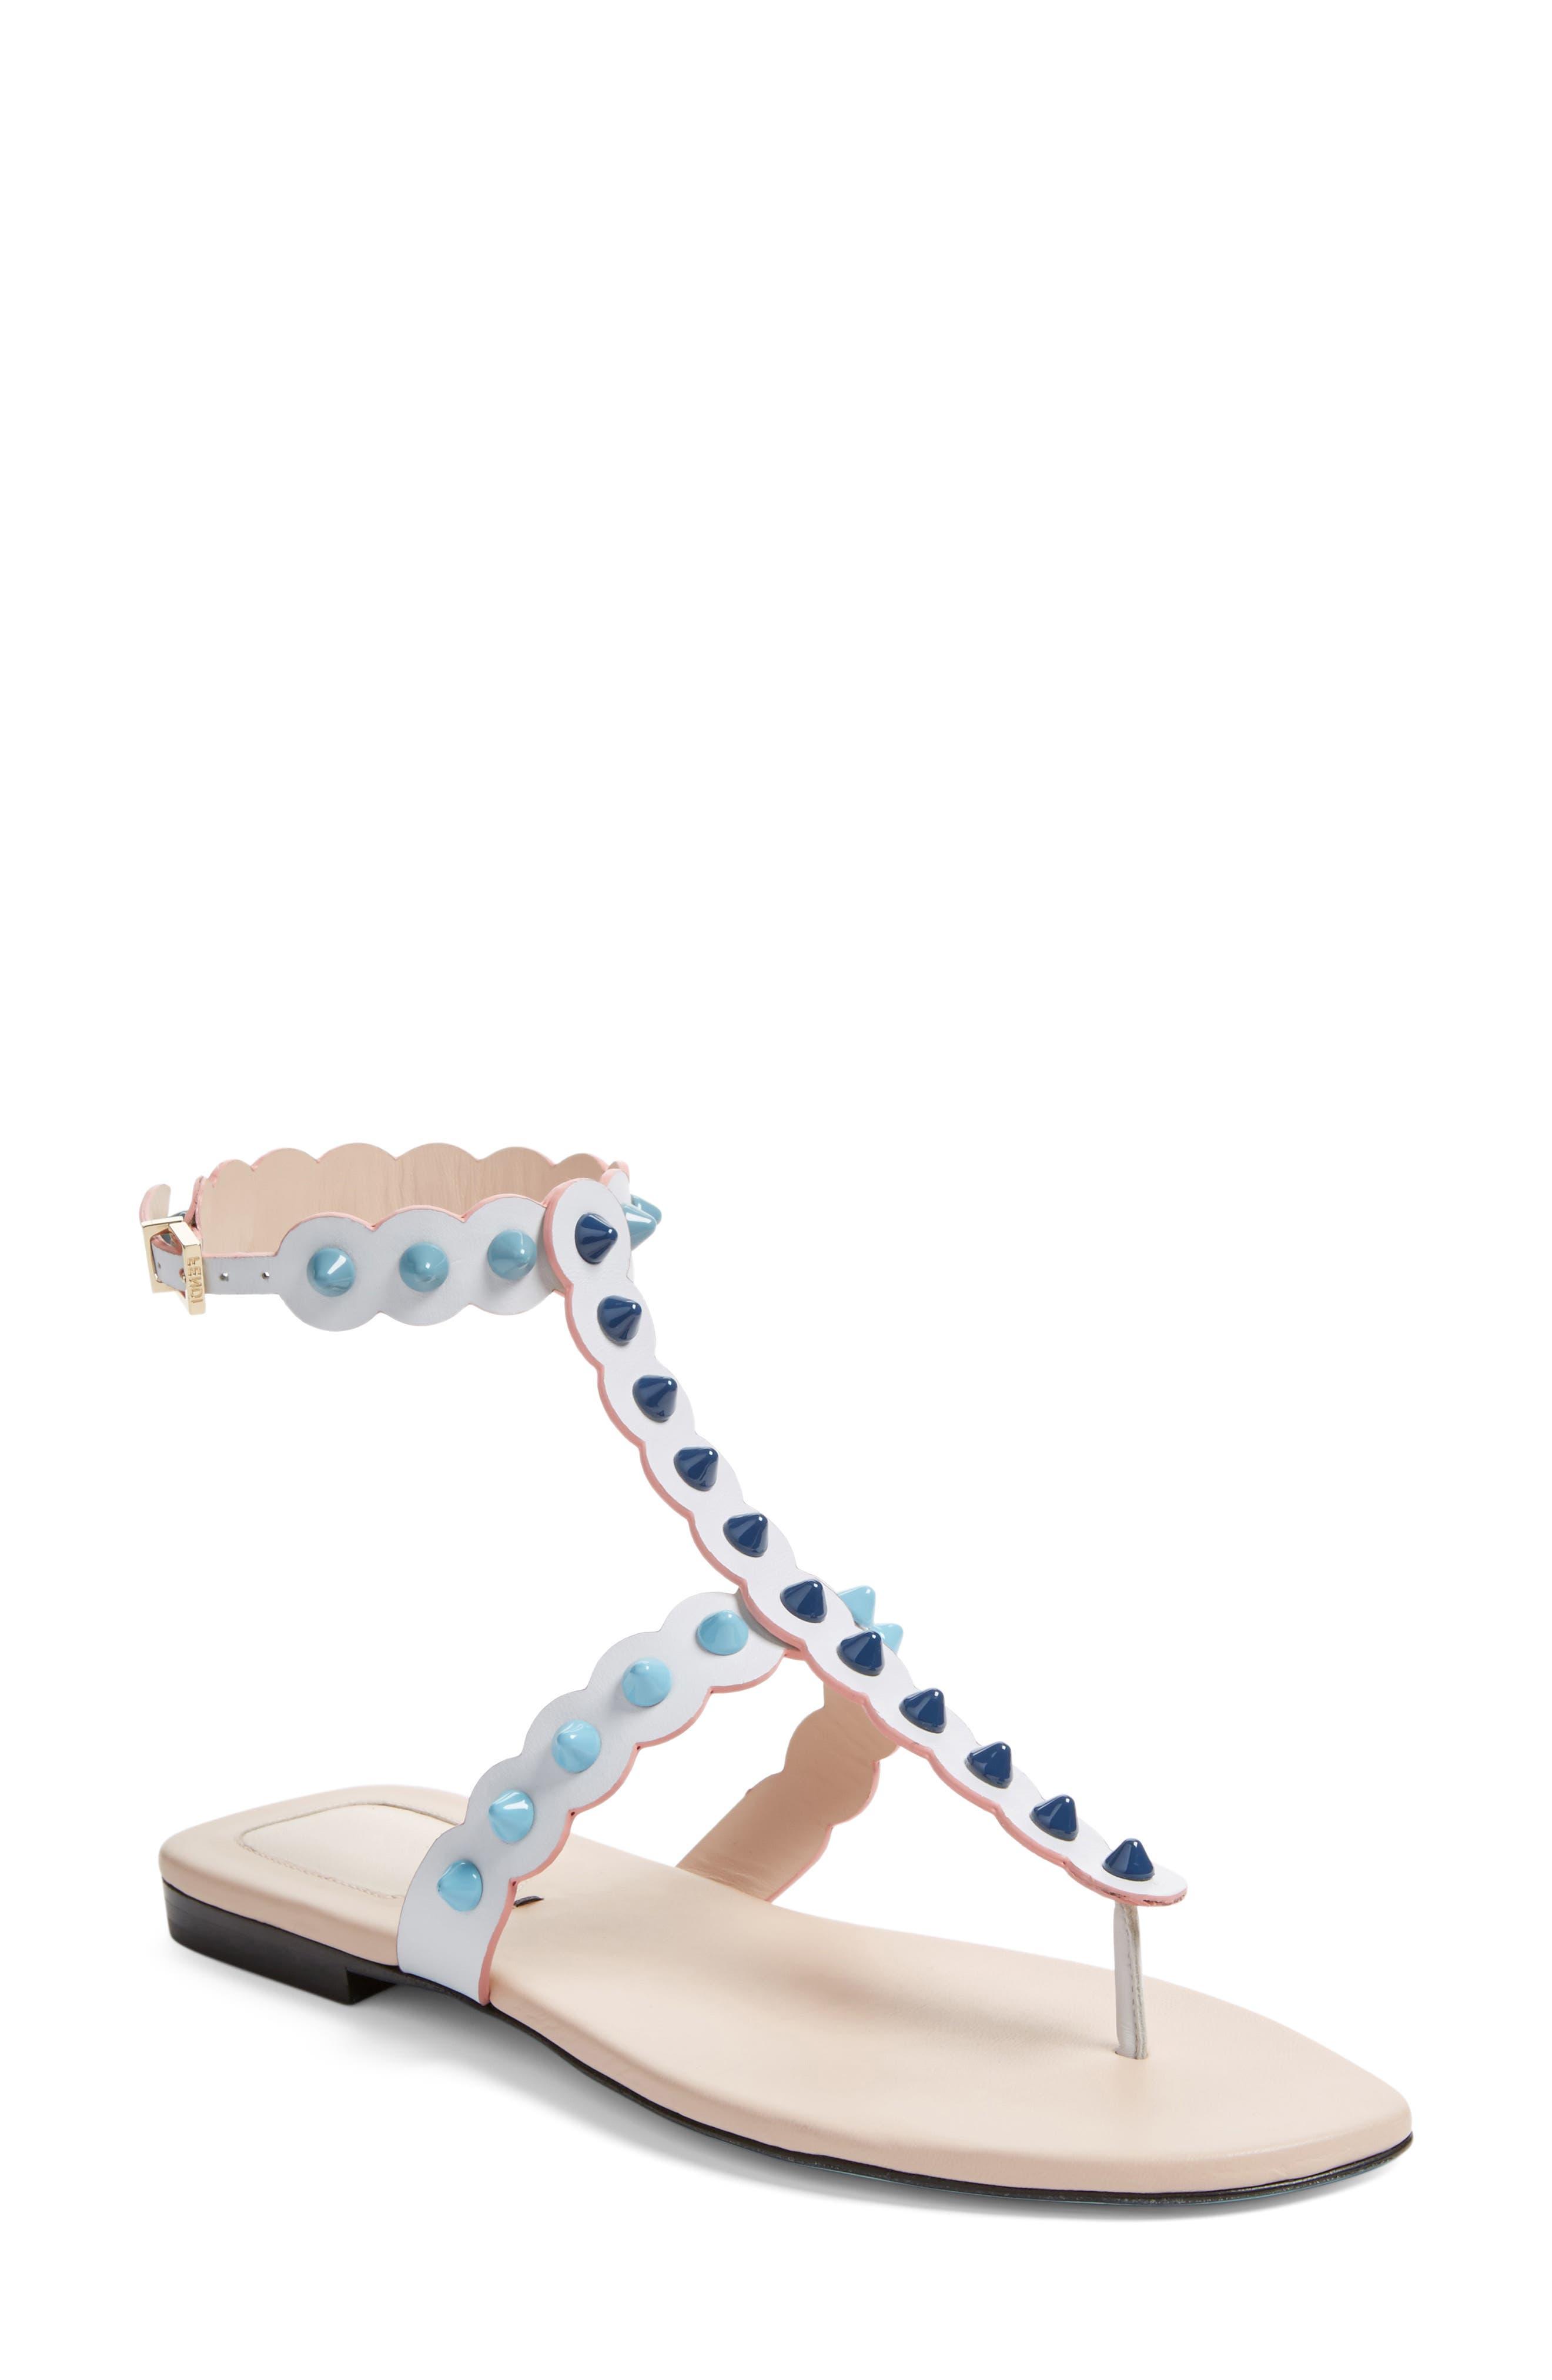 Main Image - Fendi Studded Gladiator Sandal (Women)